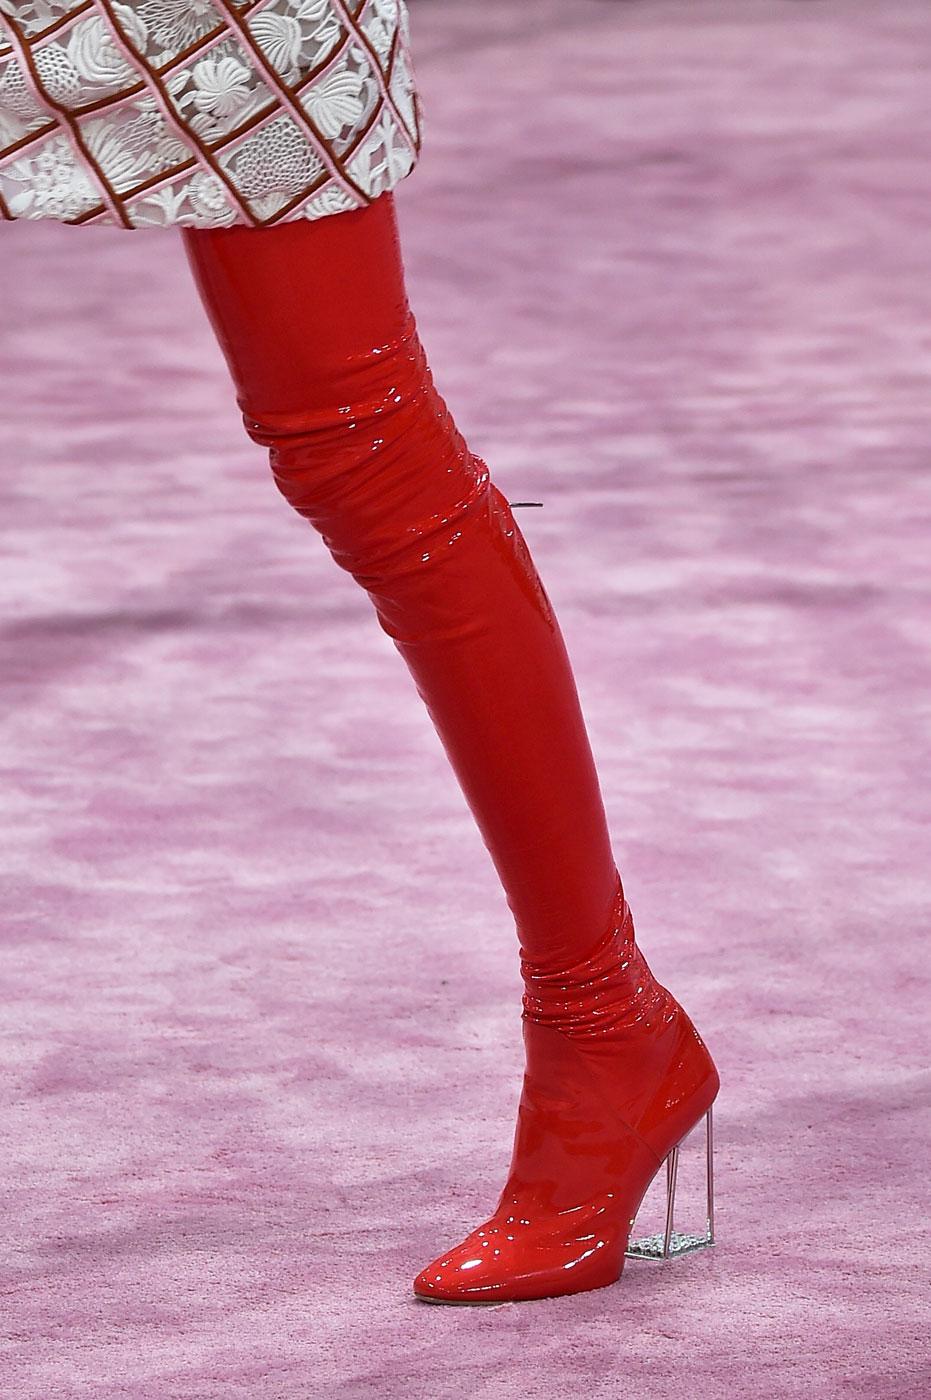 Christian-Dior-fashion-runway-show-close-ups-haute-couture-paris-spring-summer-2015-the-impression-172